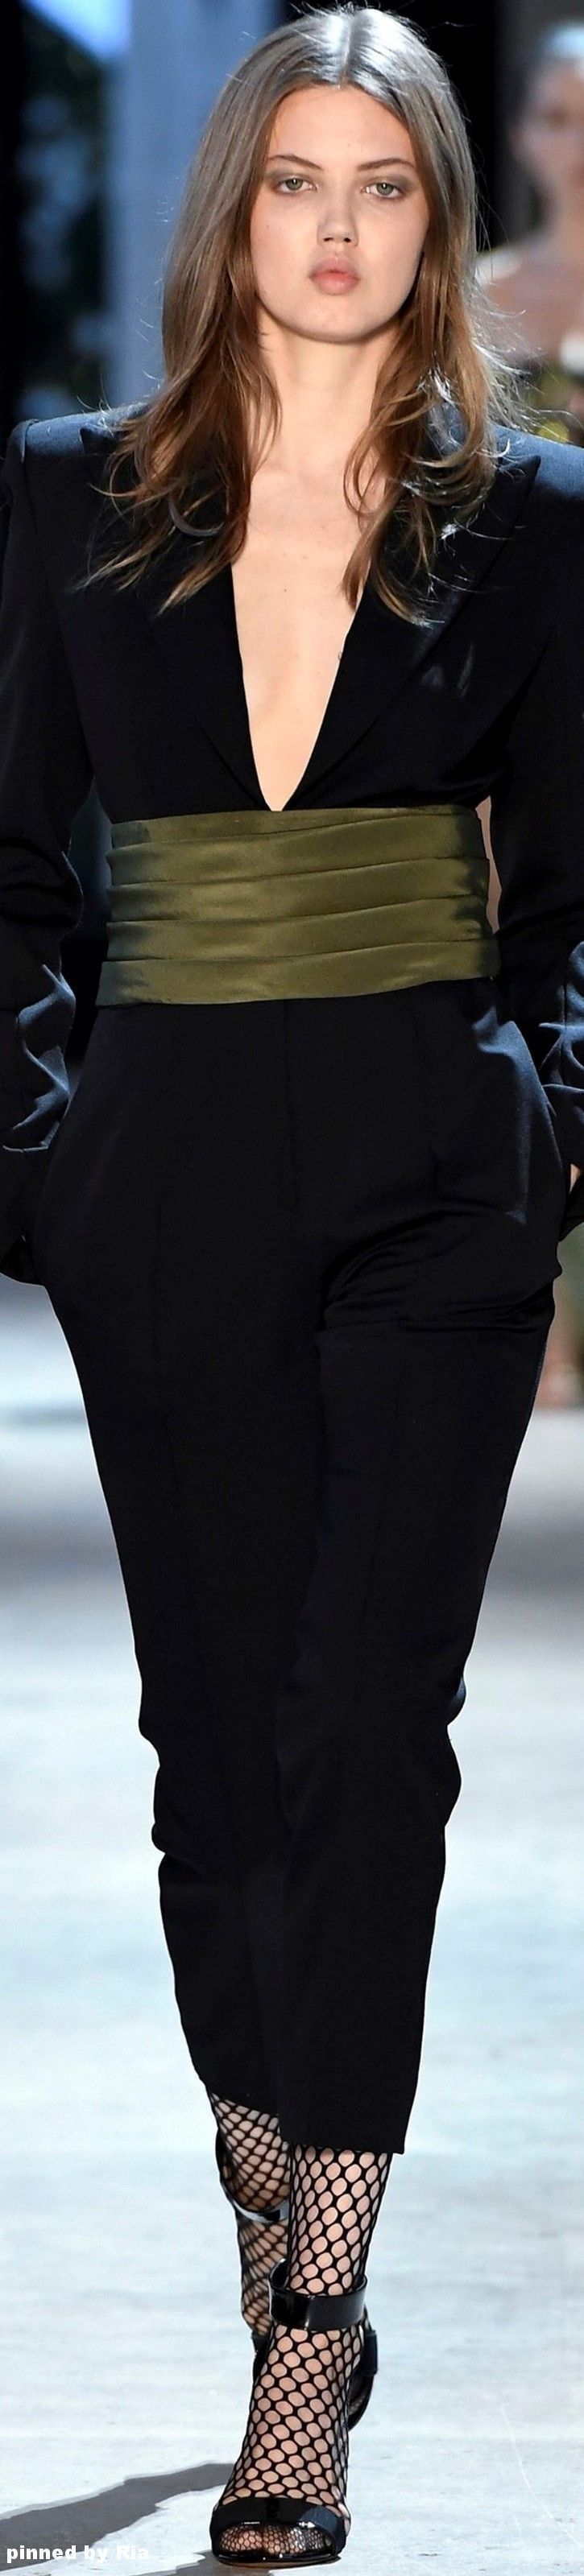 Alexandre Vauthier FW 2016-17 Couture l Ria                                                                                                                                                                                 More